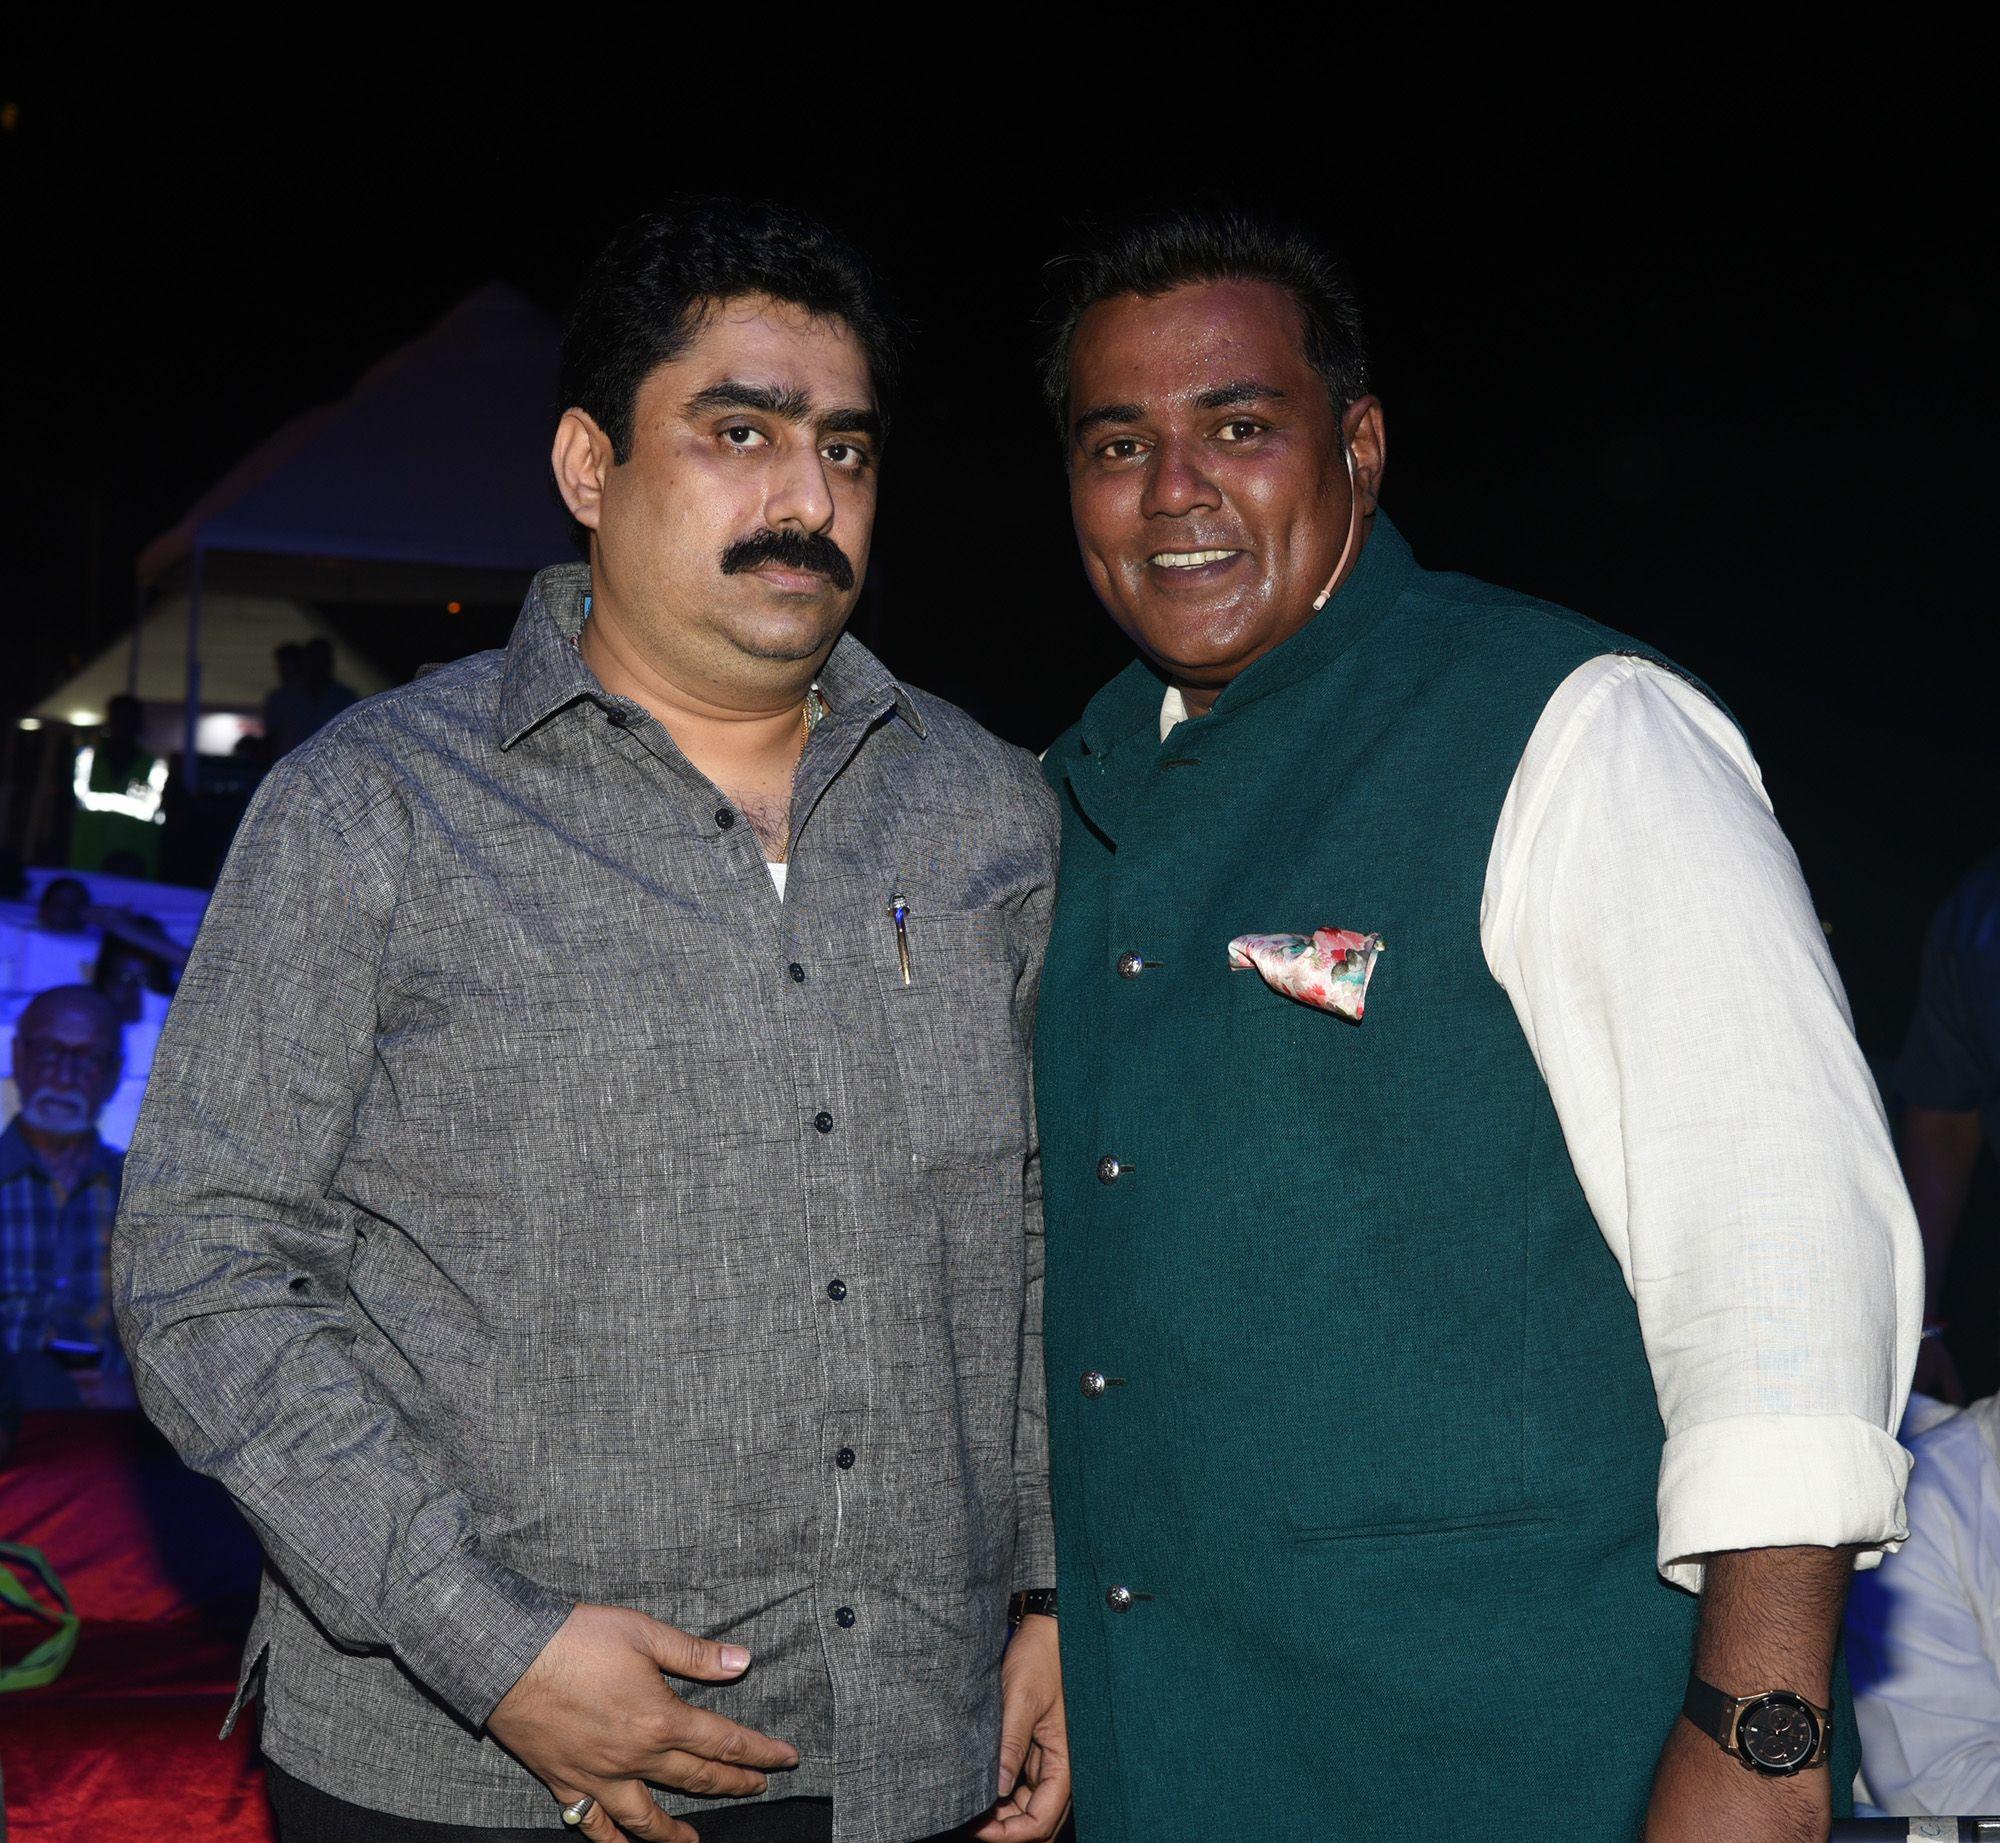 819e5f8076d Sanjay Dina Patil and Meraj Husain at Bhamla Foundation s World Environment  Day celebrations at Carter Road